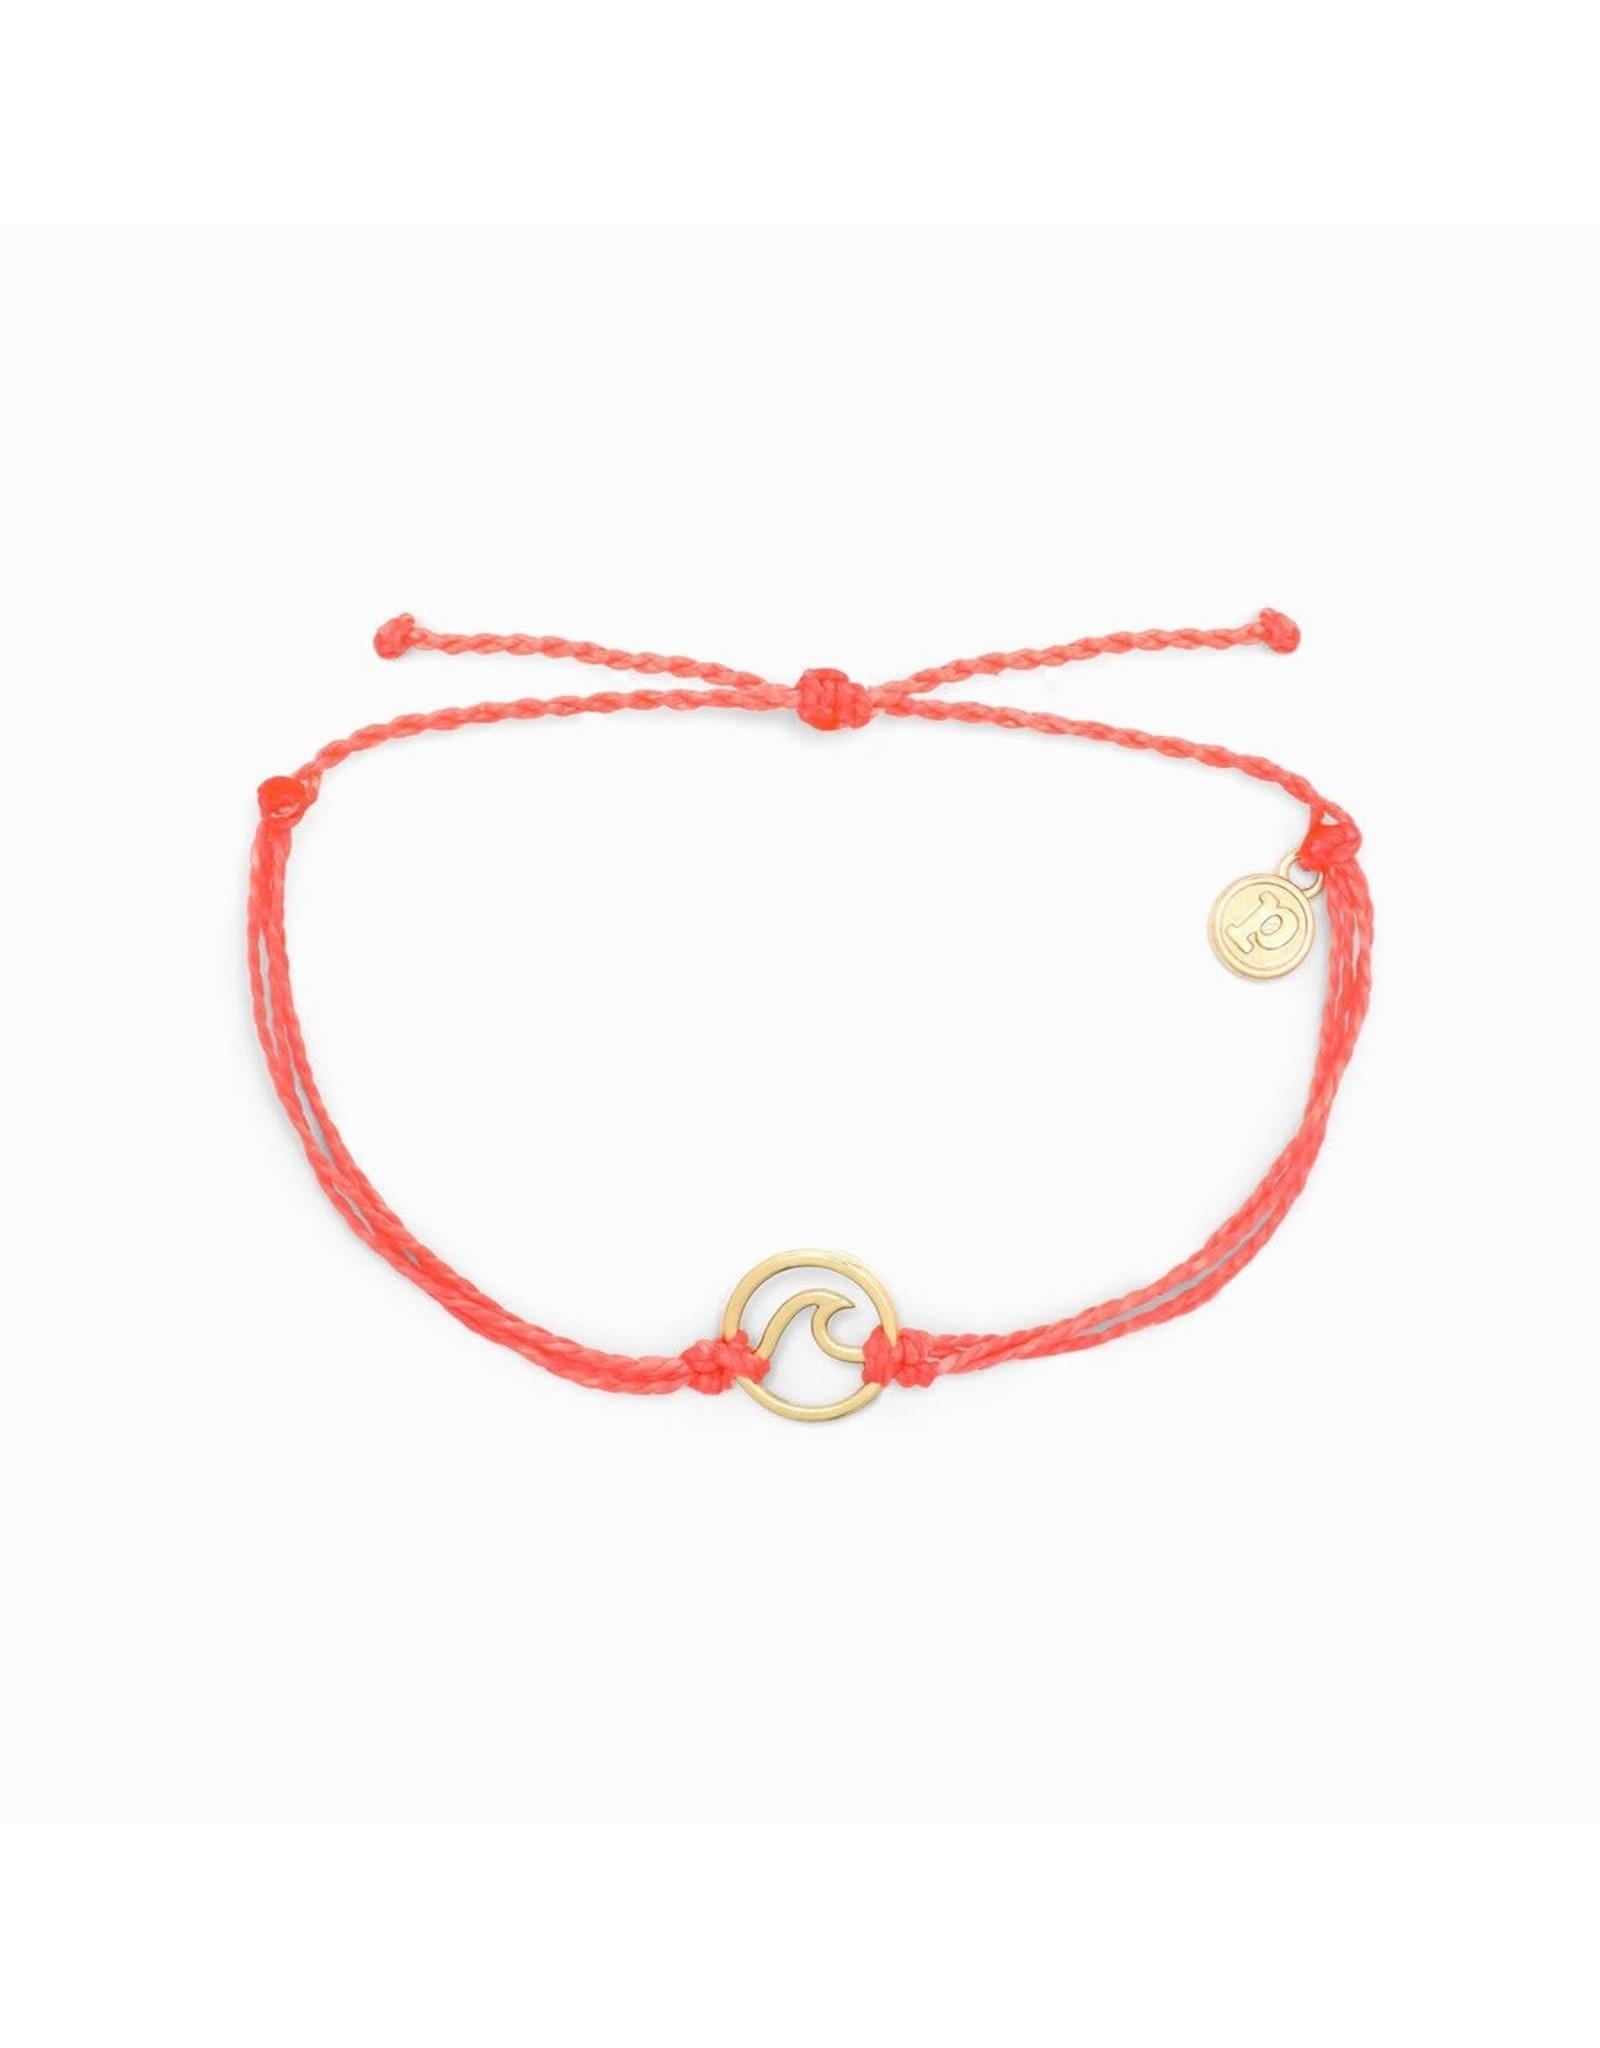 ROSE GOLD WAVE Bracelet, SALMON